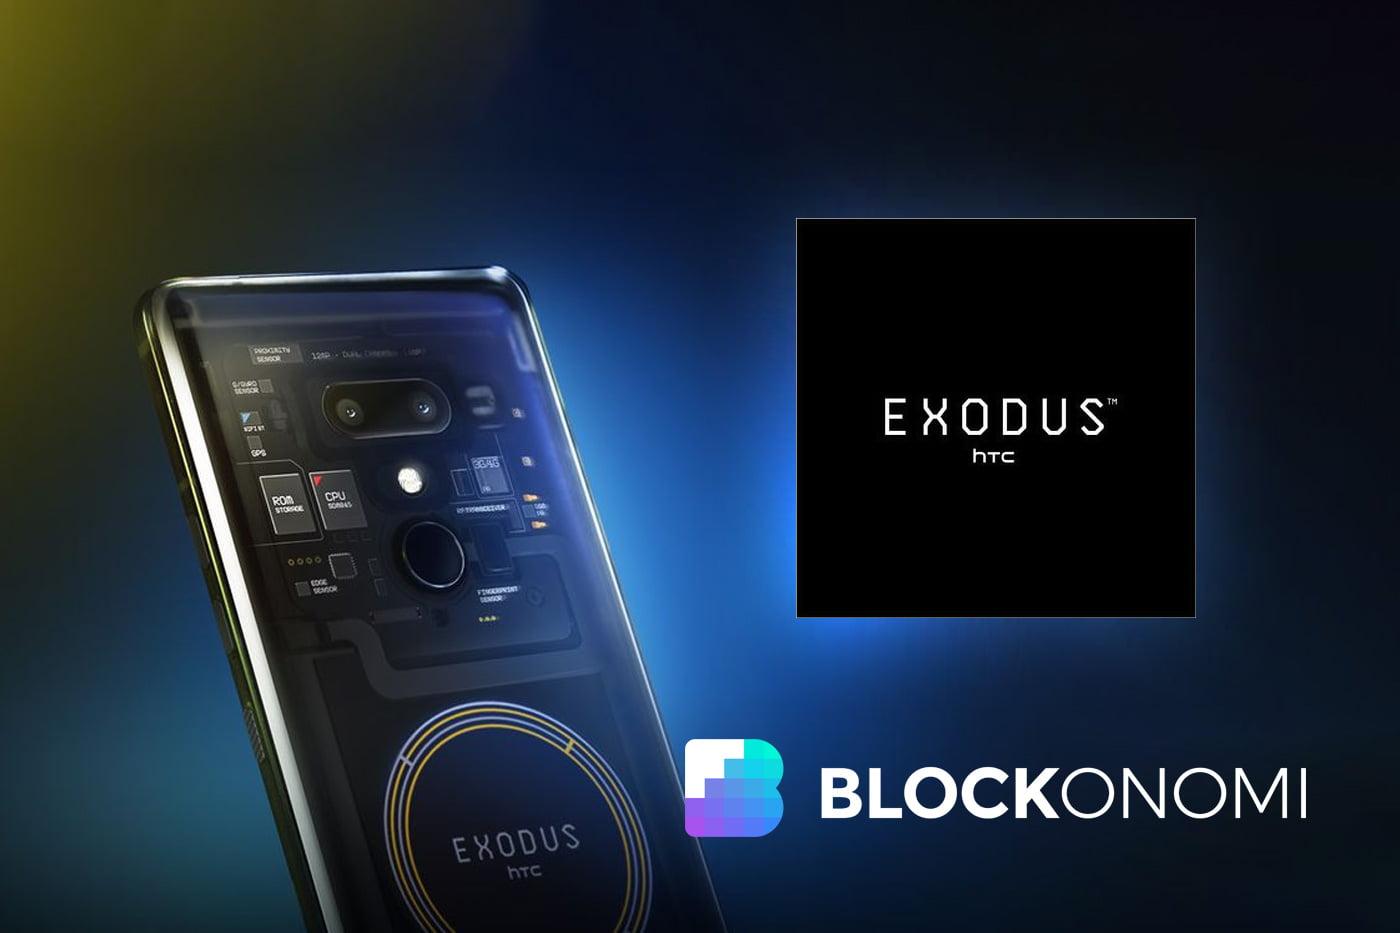 HTC Release Blockchain Phone Exodus 1s